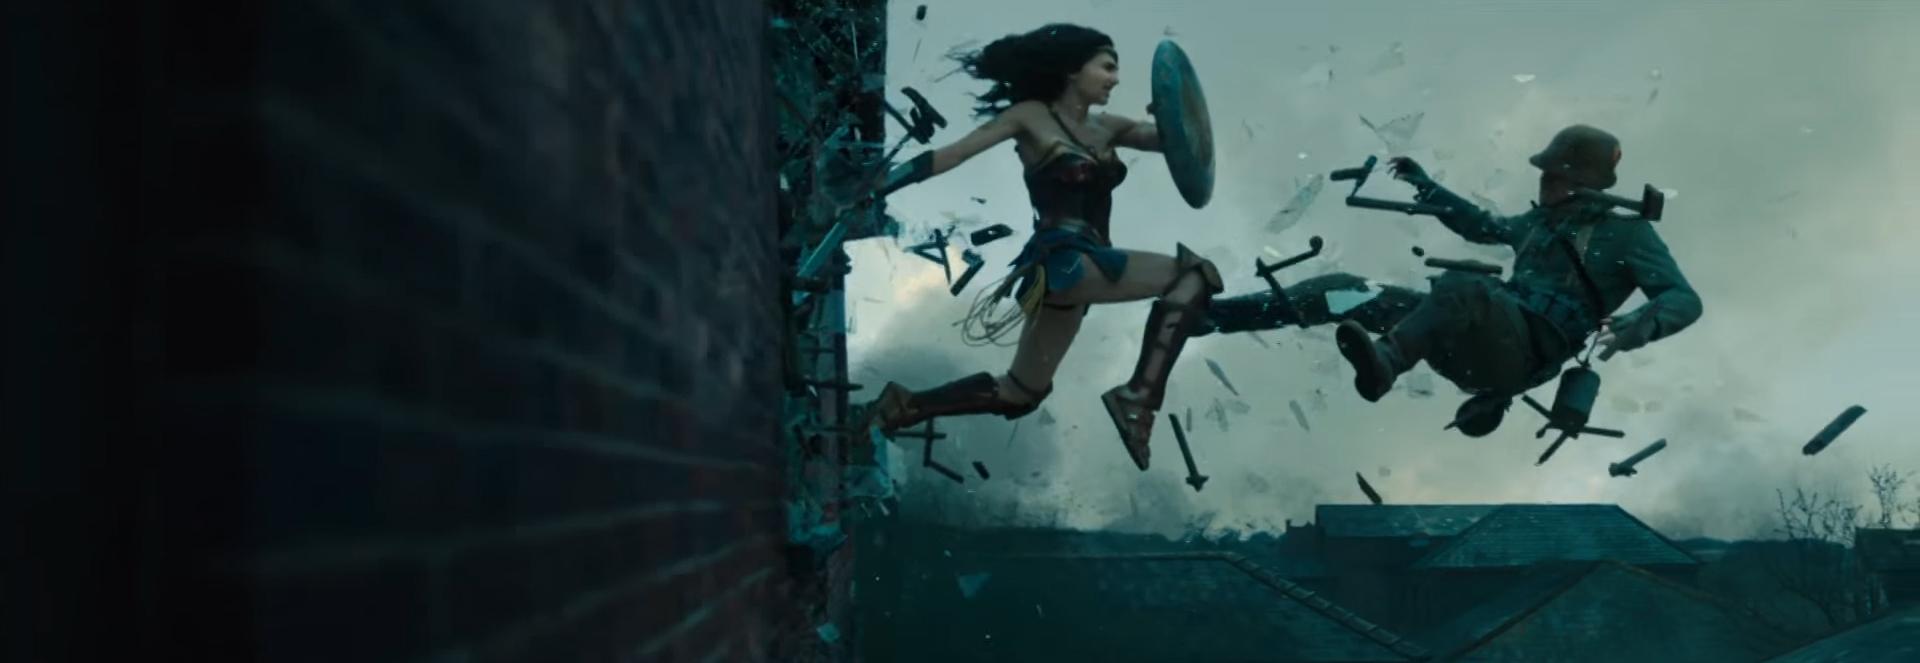 Image Credit: Warner Bros